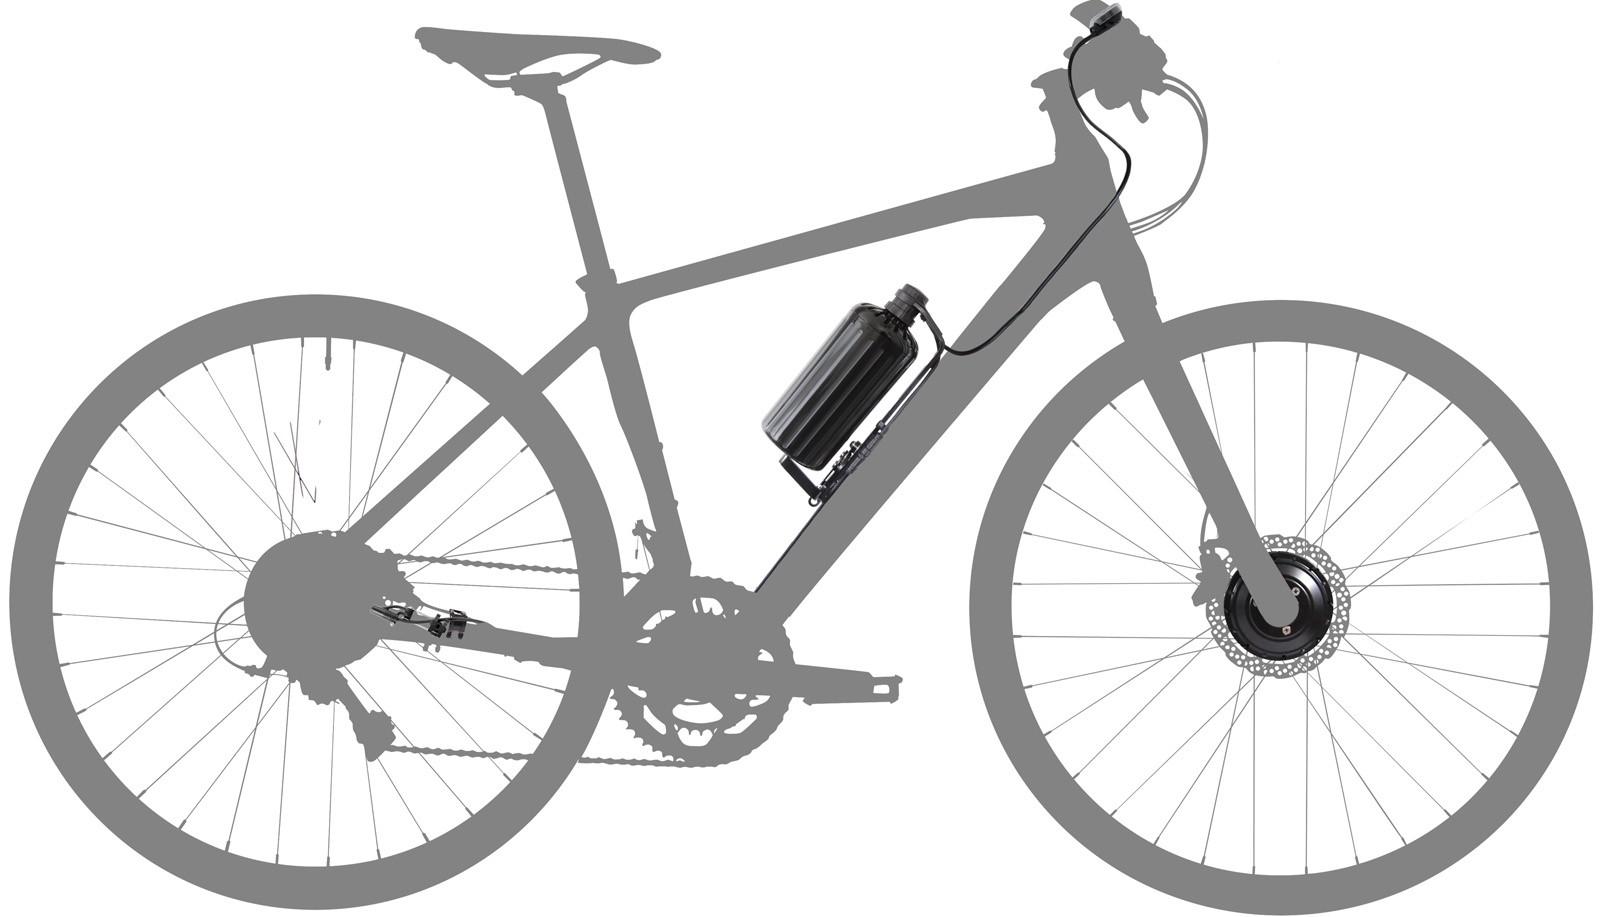 Bike brake pads 60 mm 70 mm brake bicycle brake mtb cleats City Bike